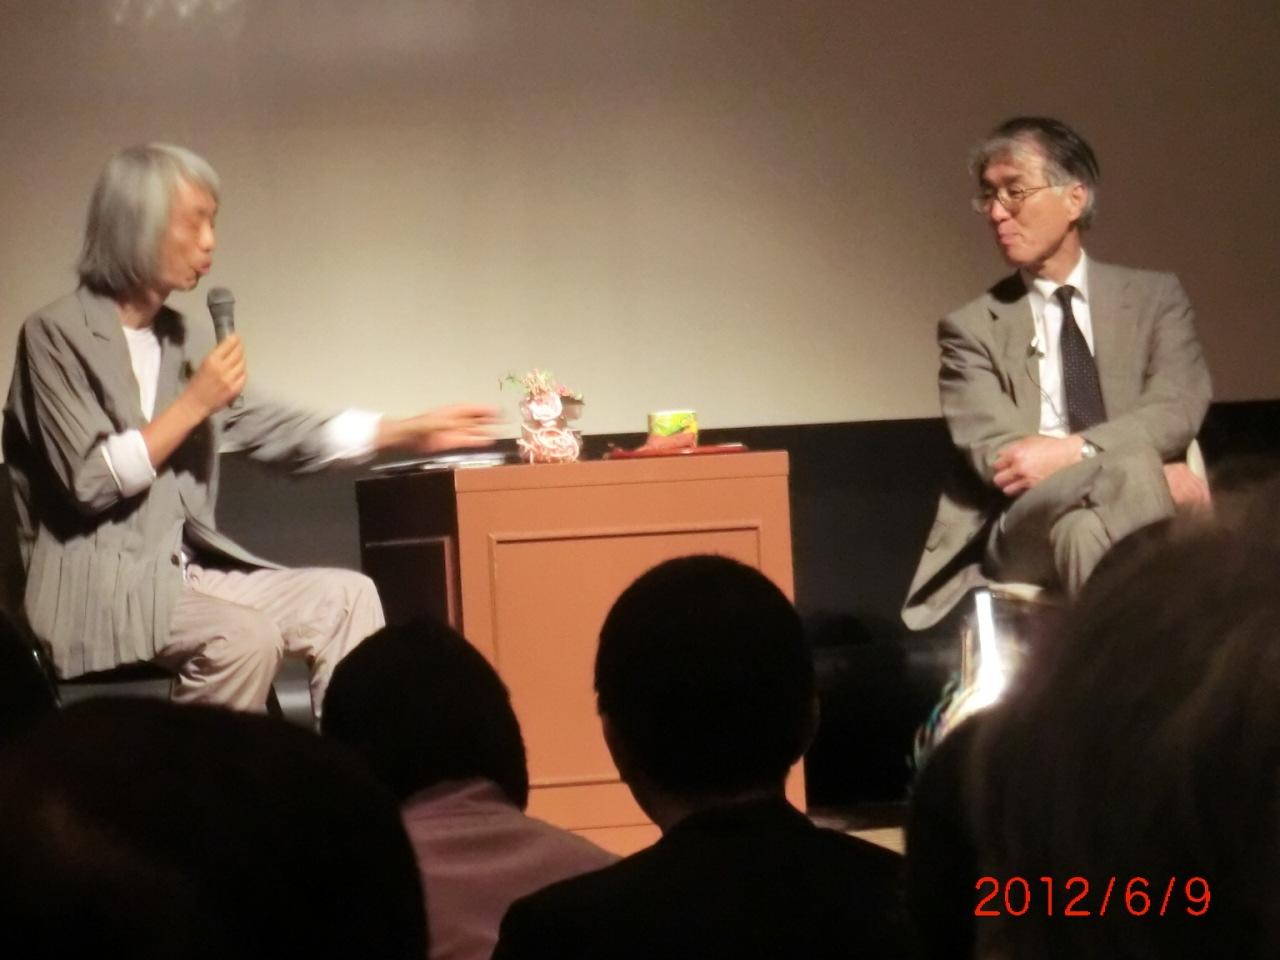 http://www.hyakuchomori.co.jp/blog2/CIMG5834.JPG